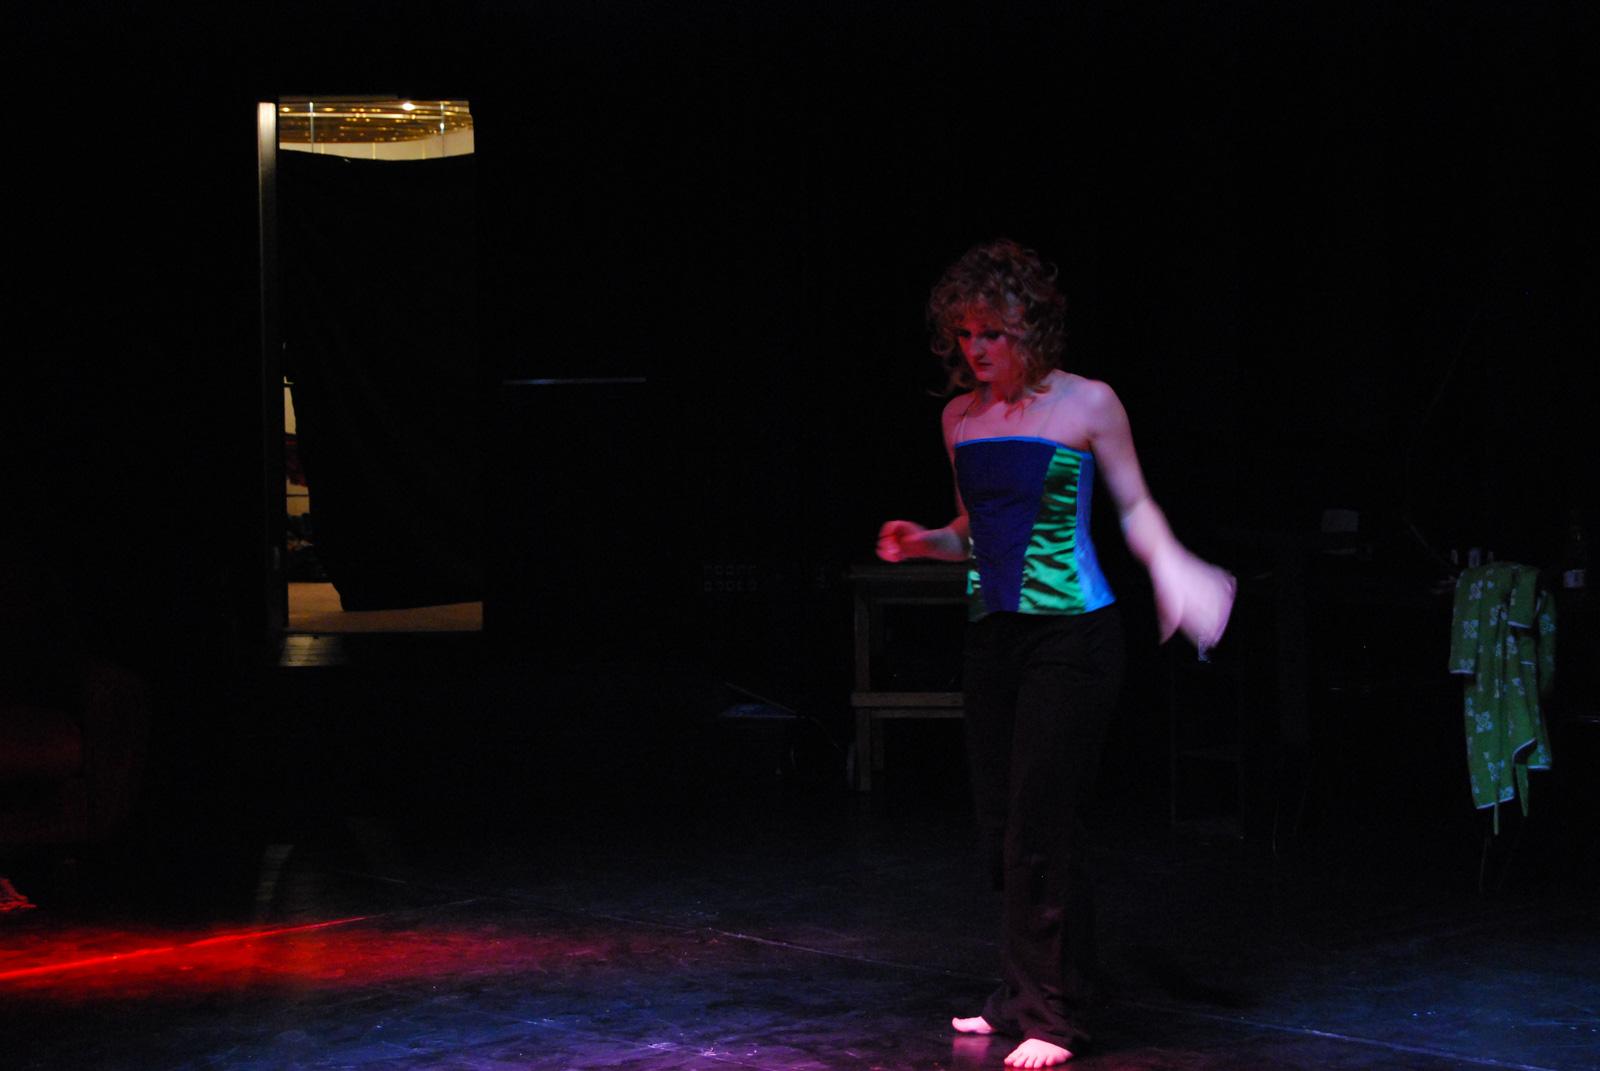 Teatro_Magico_Fantastico_3.jpg